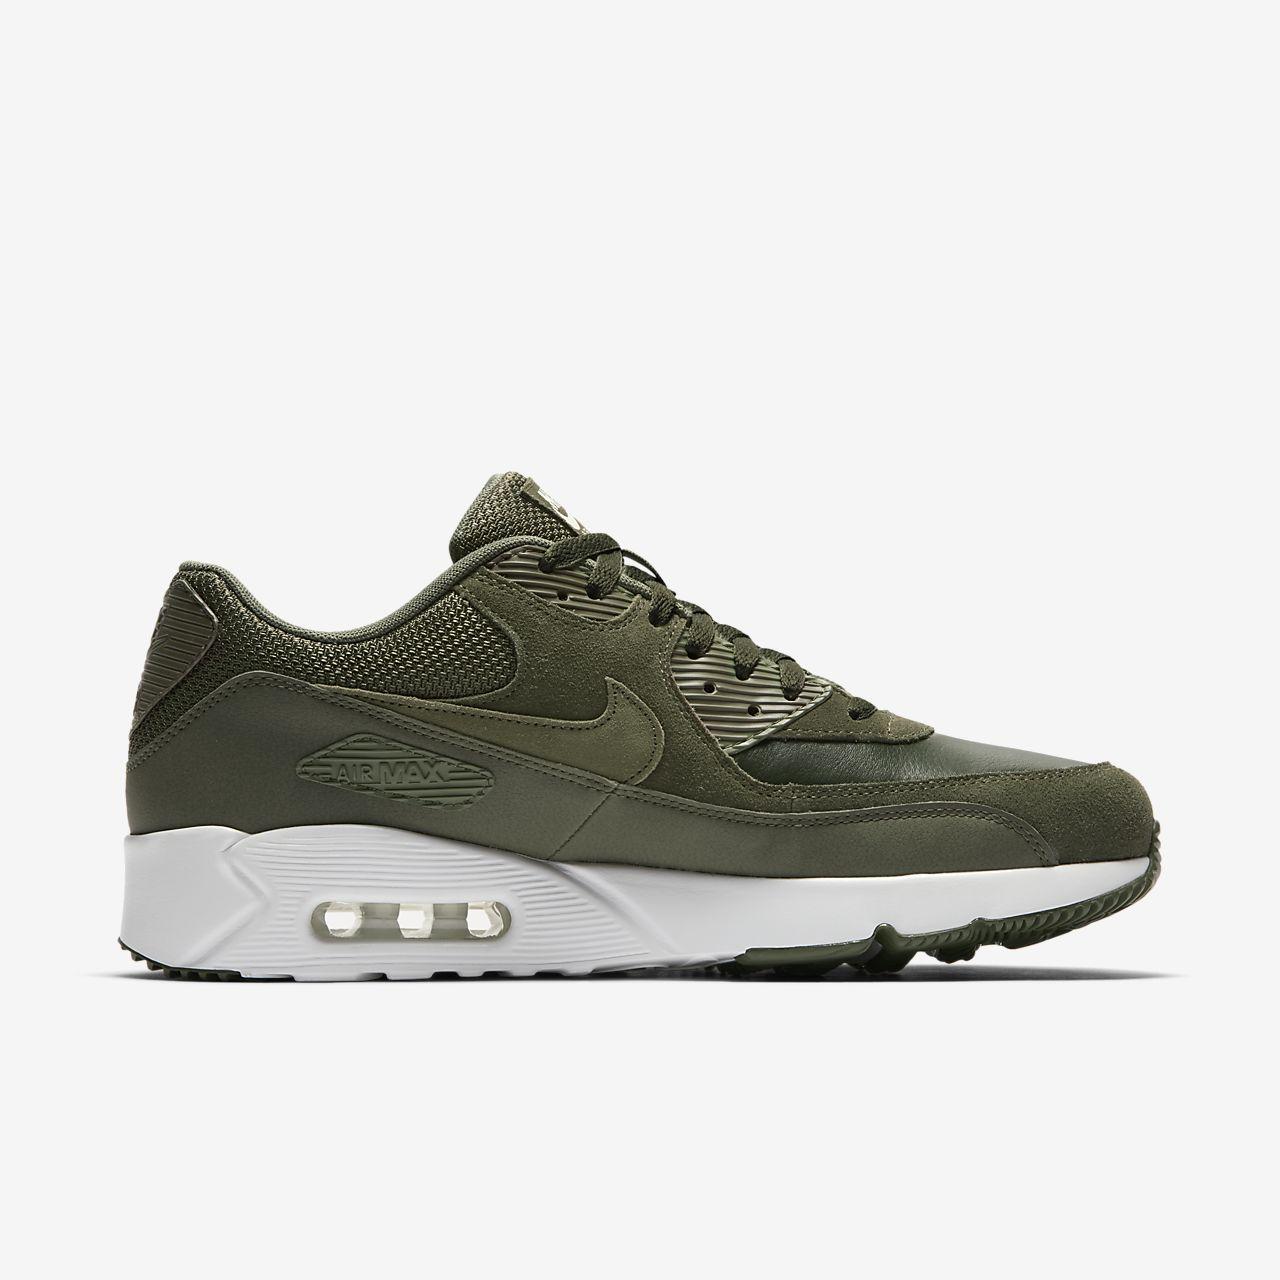 Shop Nike Mens Air Max 90 Ultra 2.0 Ease Casual Sneakers